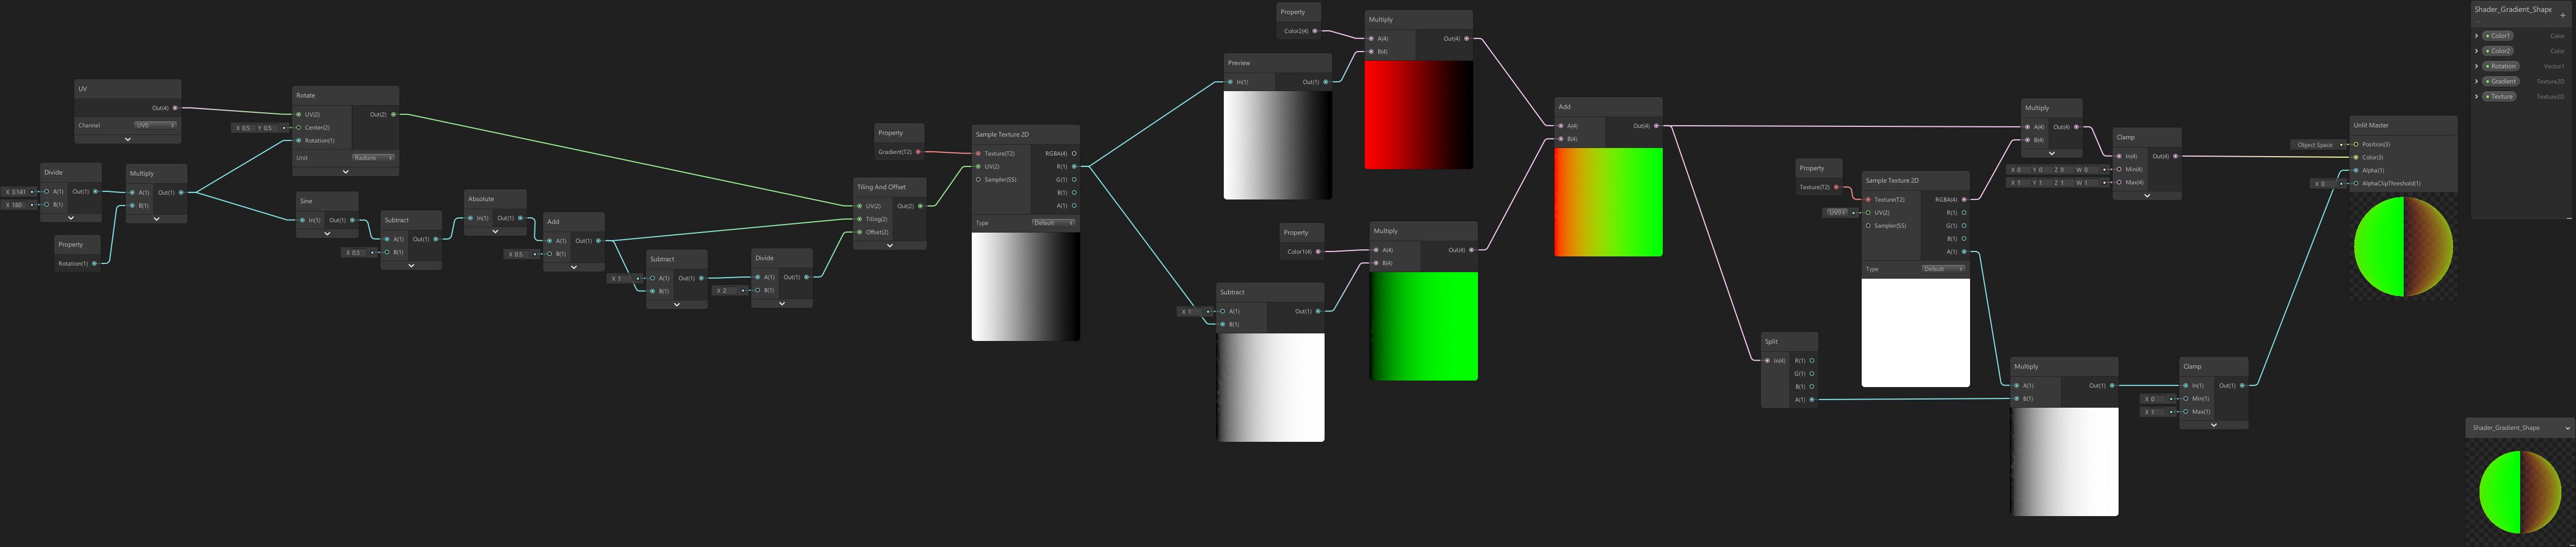 Gradient_Shader.jpg